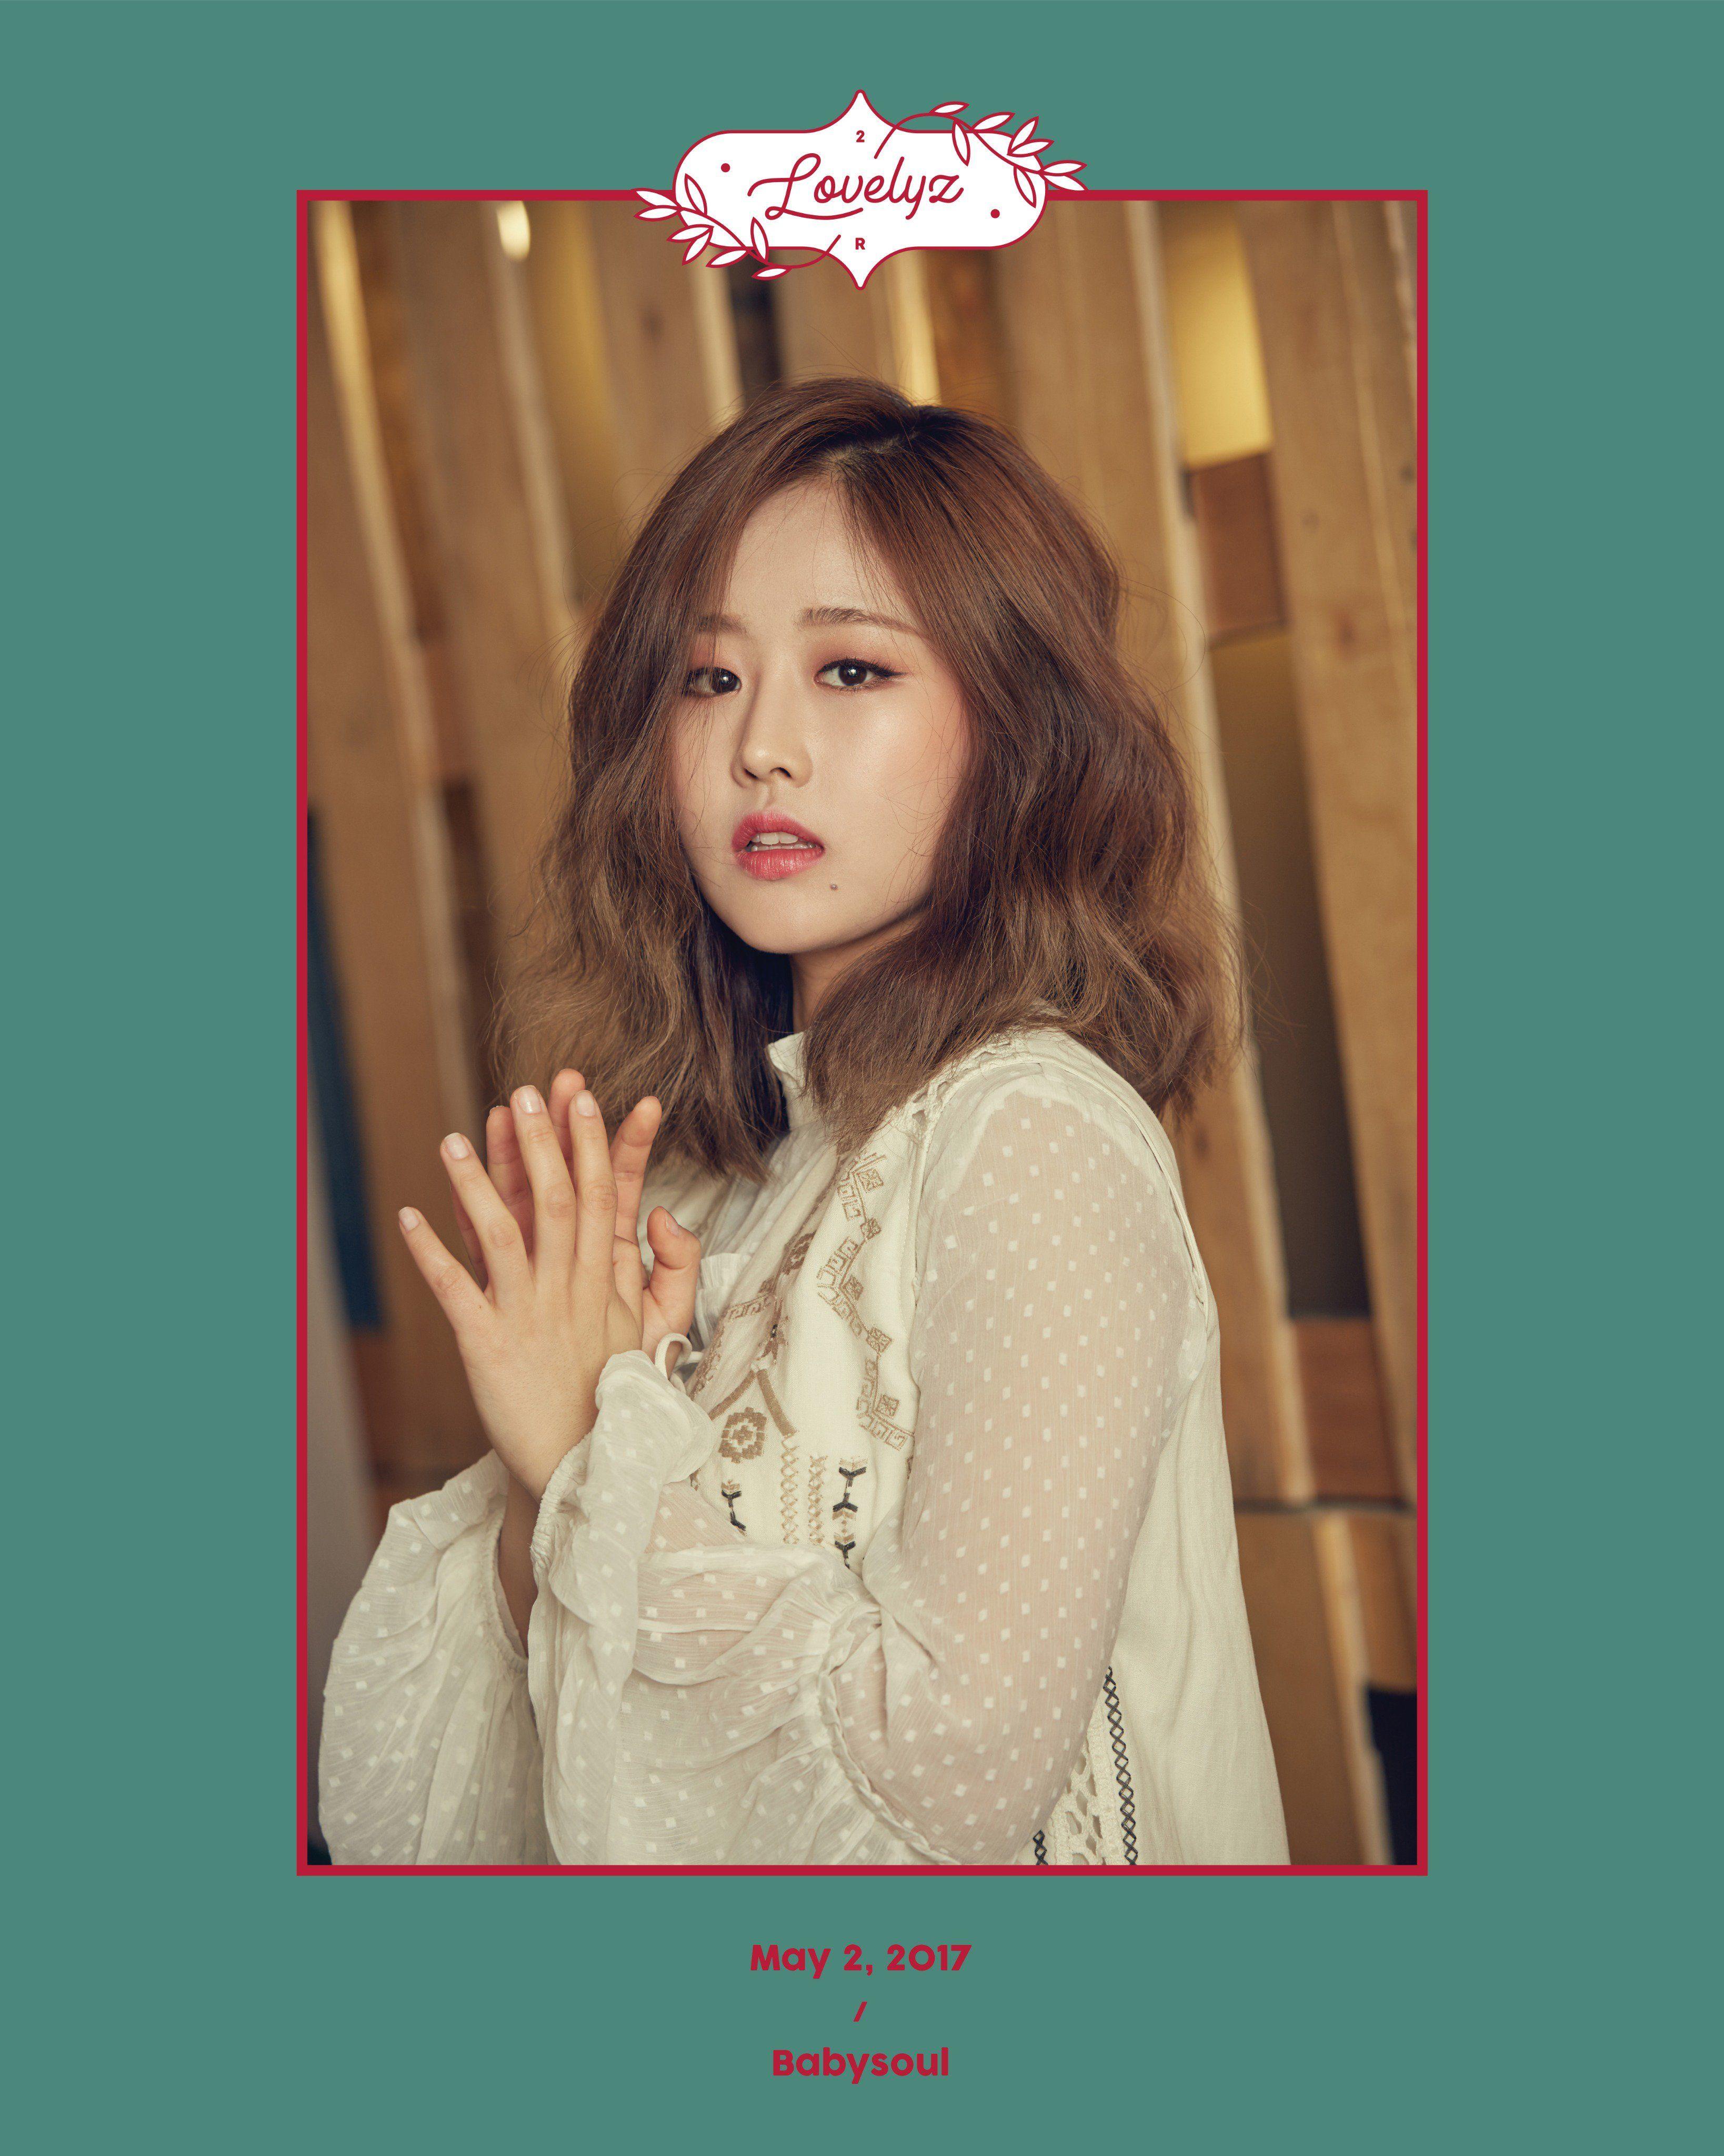 Lovelyz 2nd Album Repackage teaser image - Baby Soul